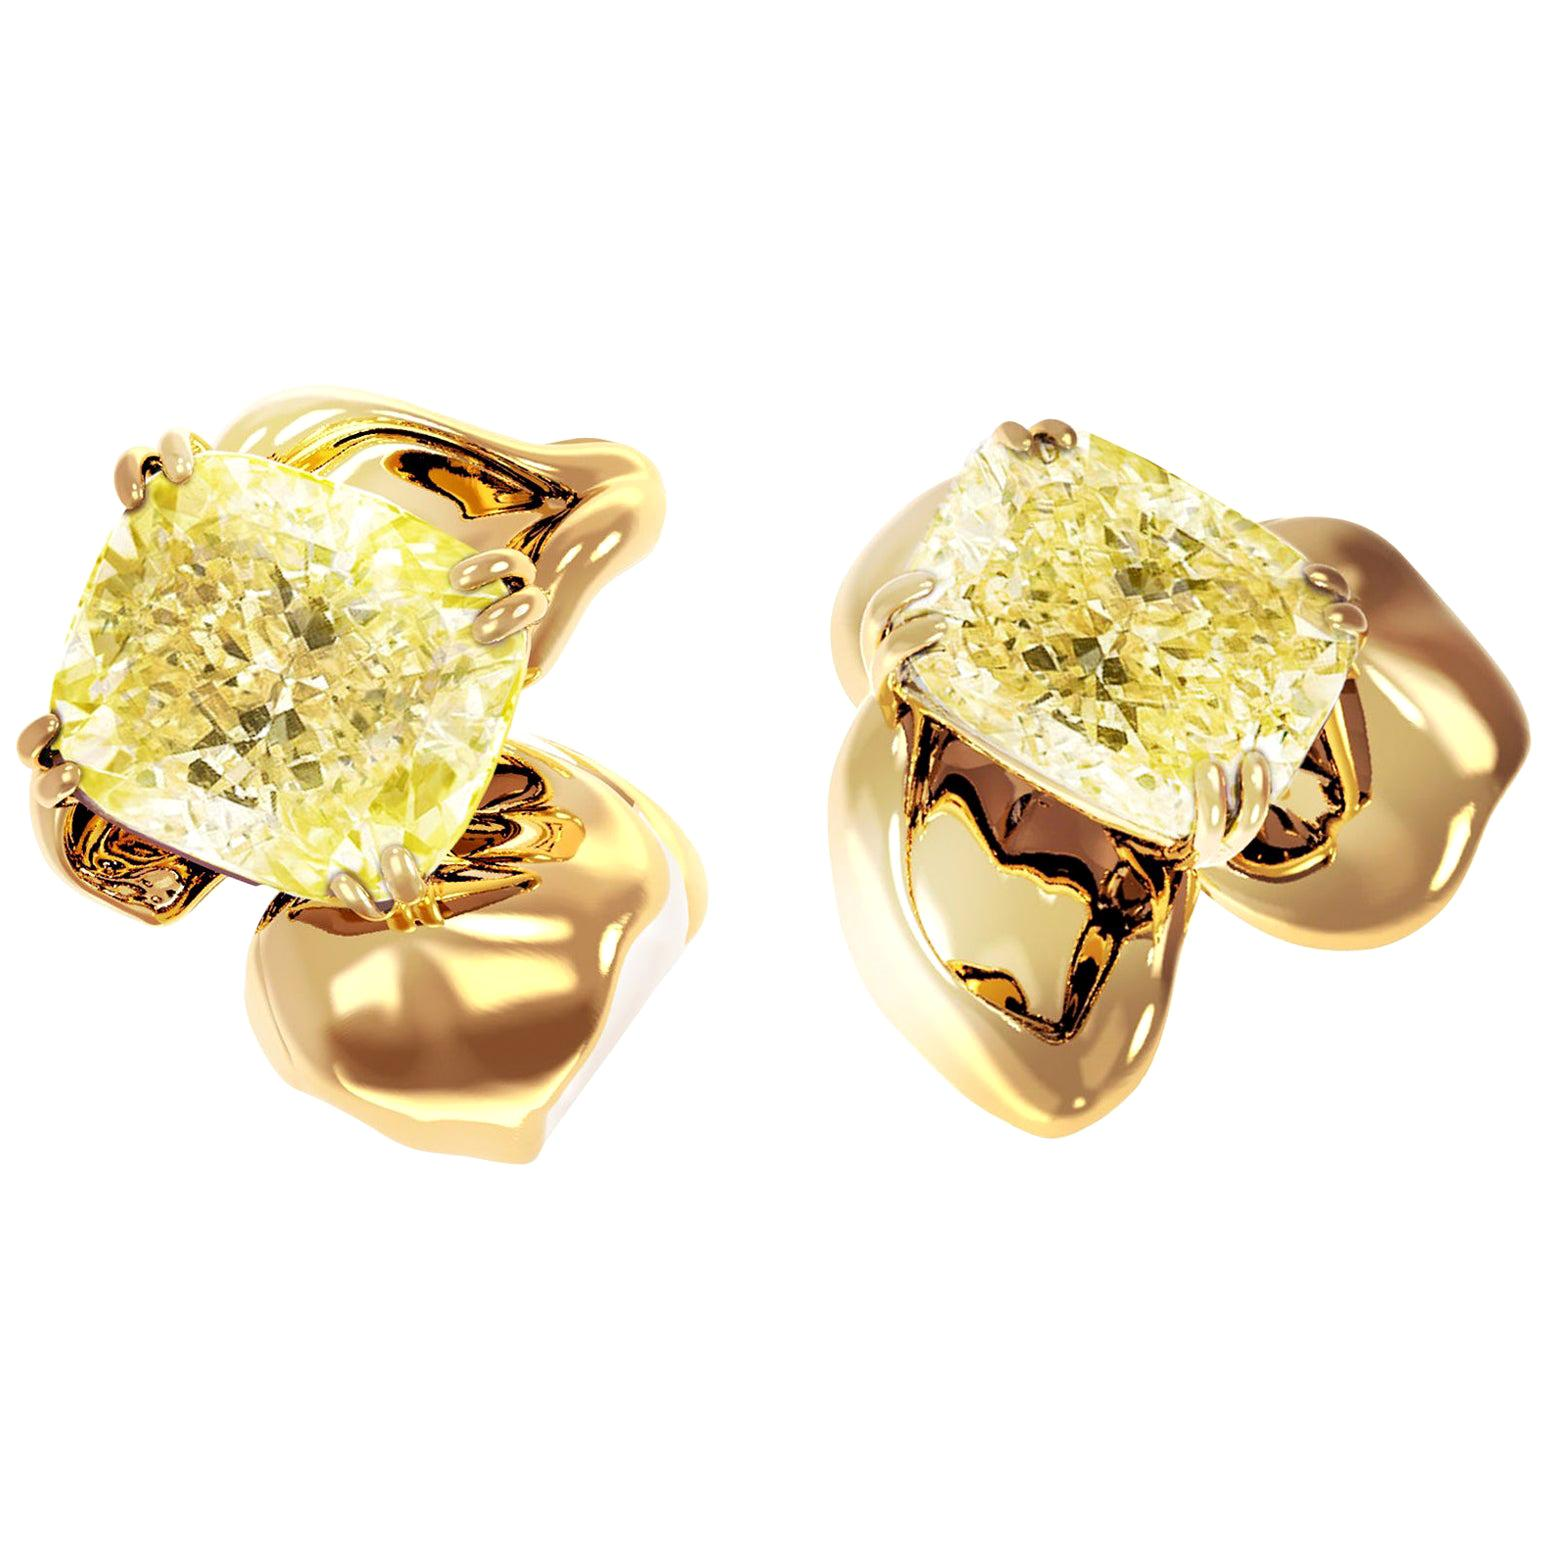 18 Karat Rose Gold Earrings with 4 Carat GIA Certified Fancy Yellow Diamonds